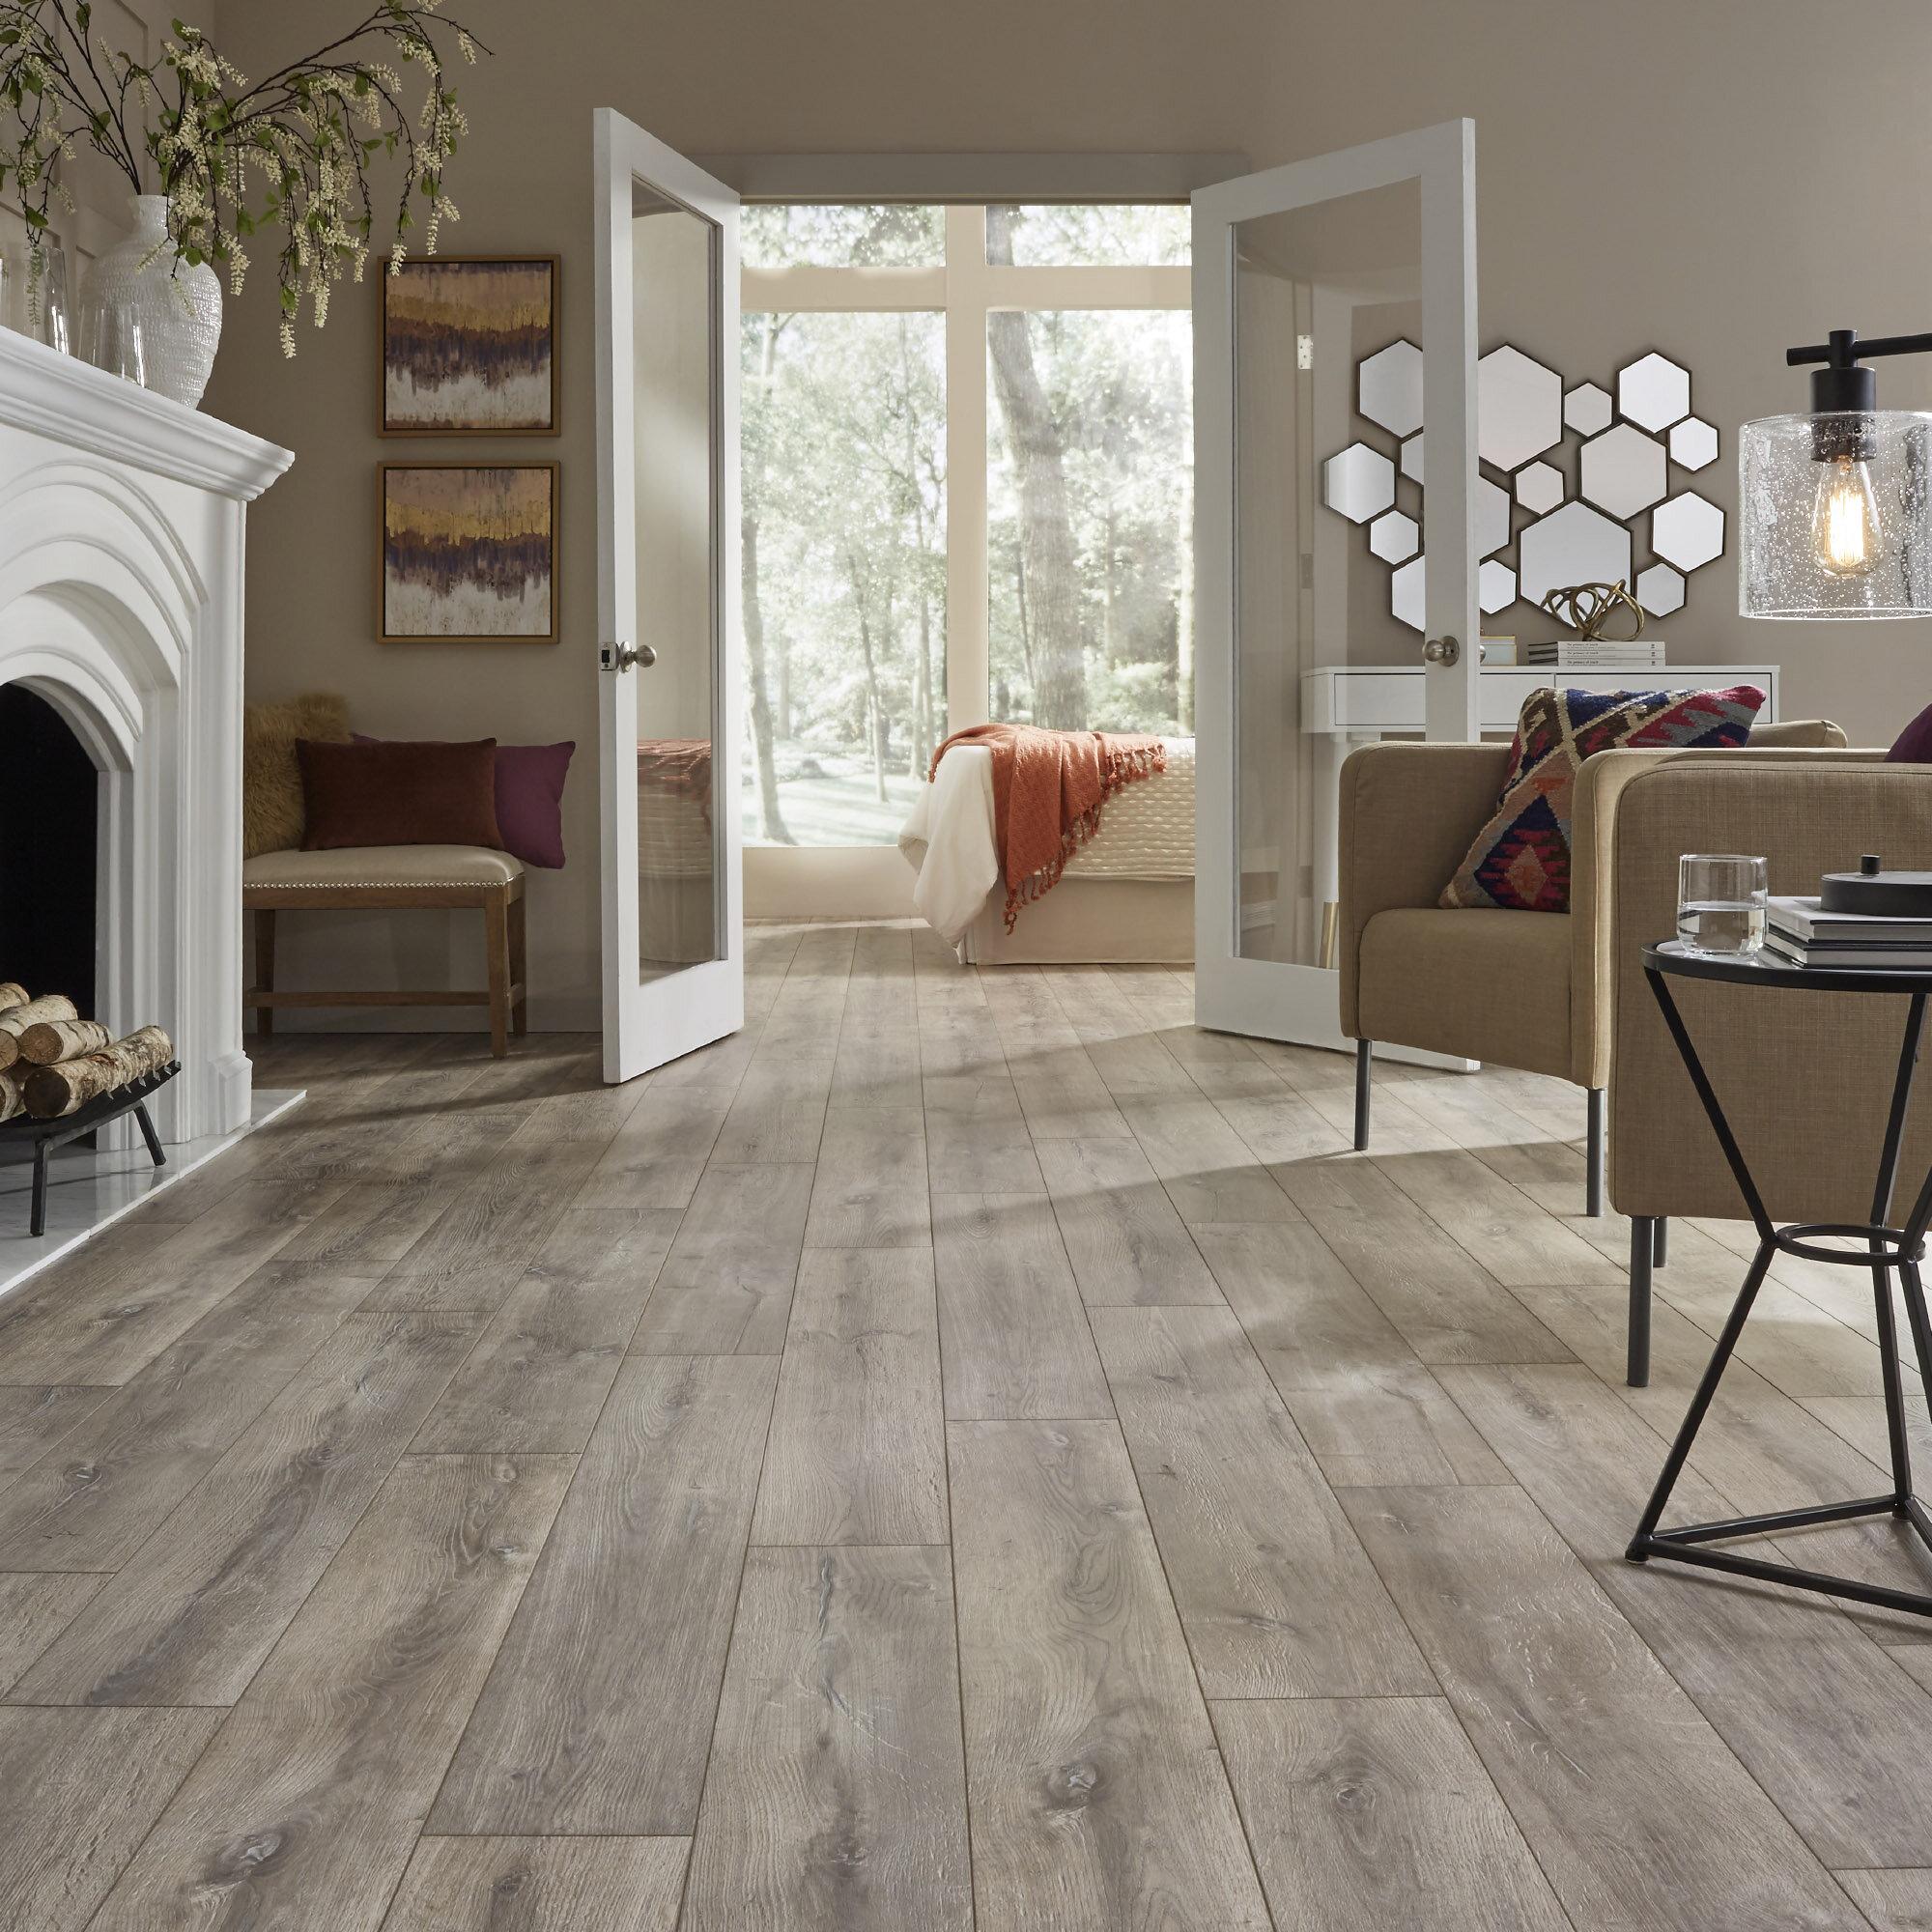 Mannington Revolution Wide Plank 8 X 51 X 12mm Oak Laminate Flooring Reviews